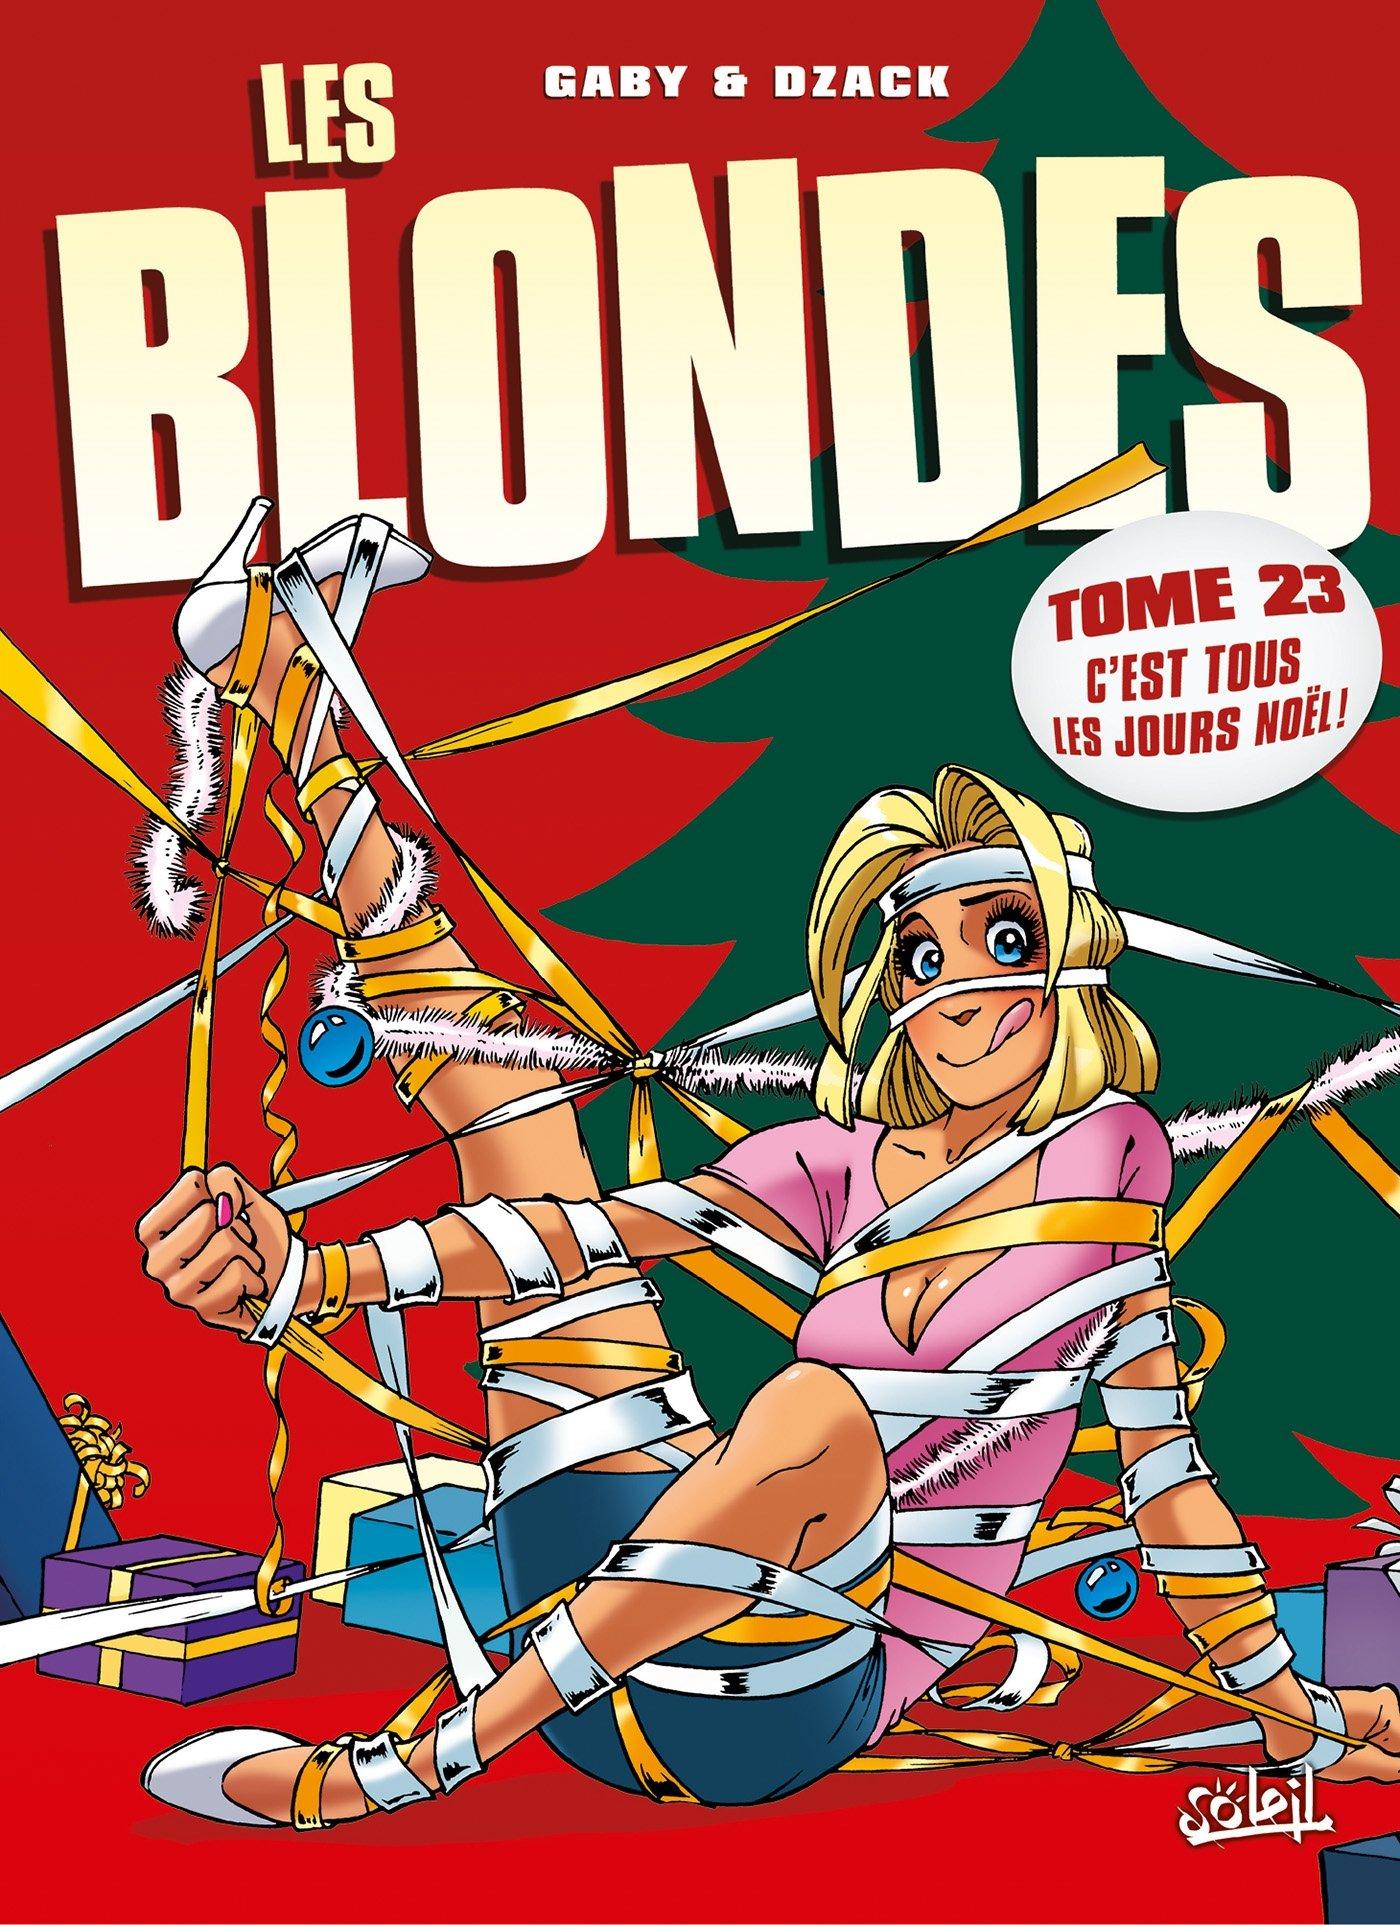 Les blondes - 28 tomes